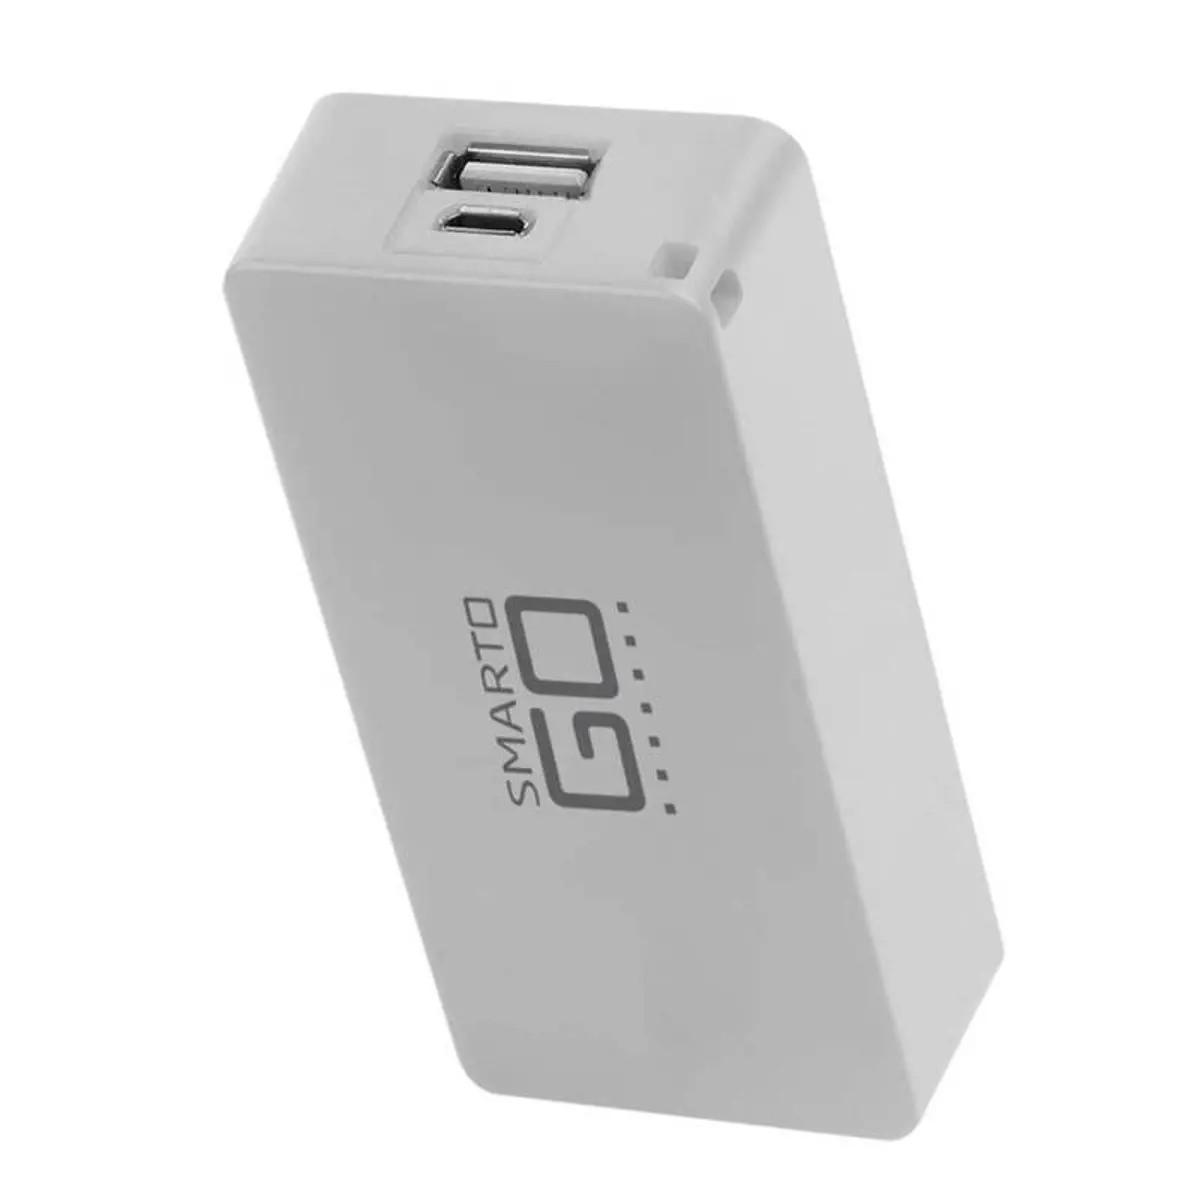 Powerbank Multilaser 4000mAh Carregador Portátil USB - CB126